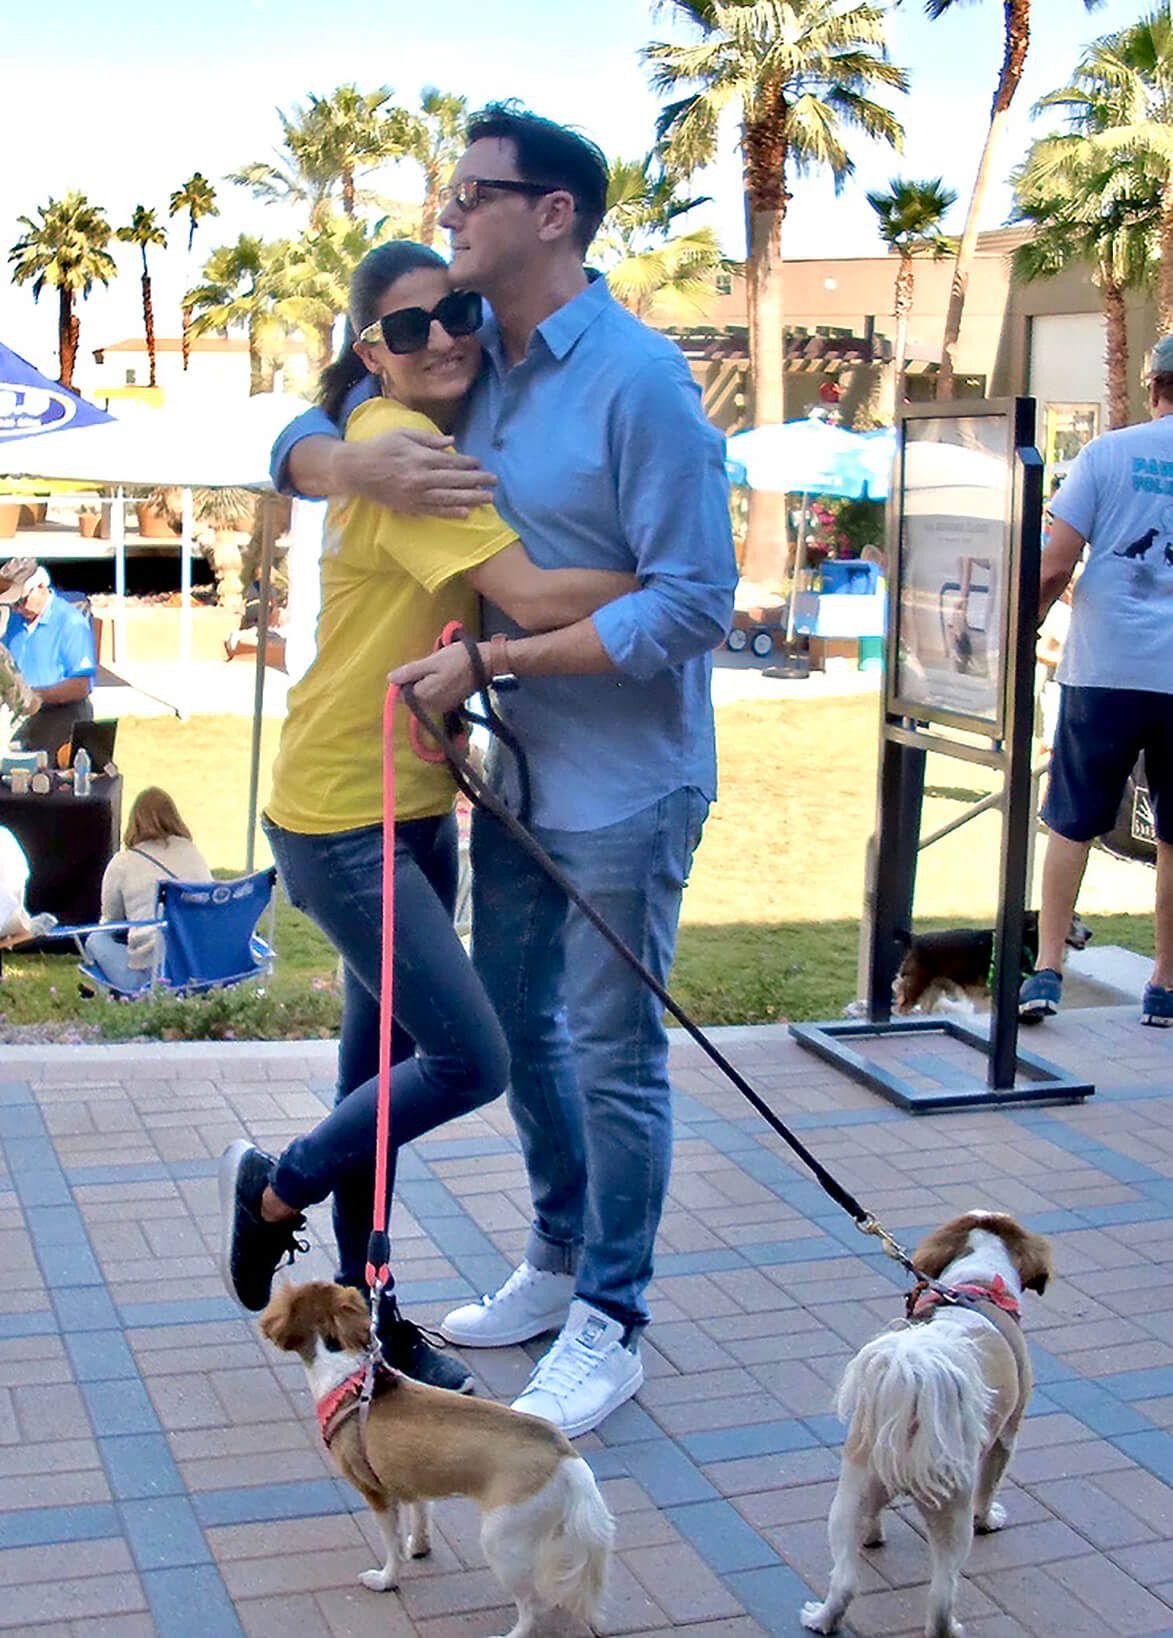 Sean Borg Attends Bianca Rae S Successful Pet Adoption Event In Palm Desert California Pet Adoption Event Pet Adoption She Dog